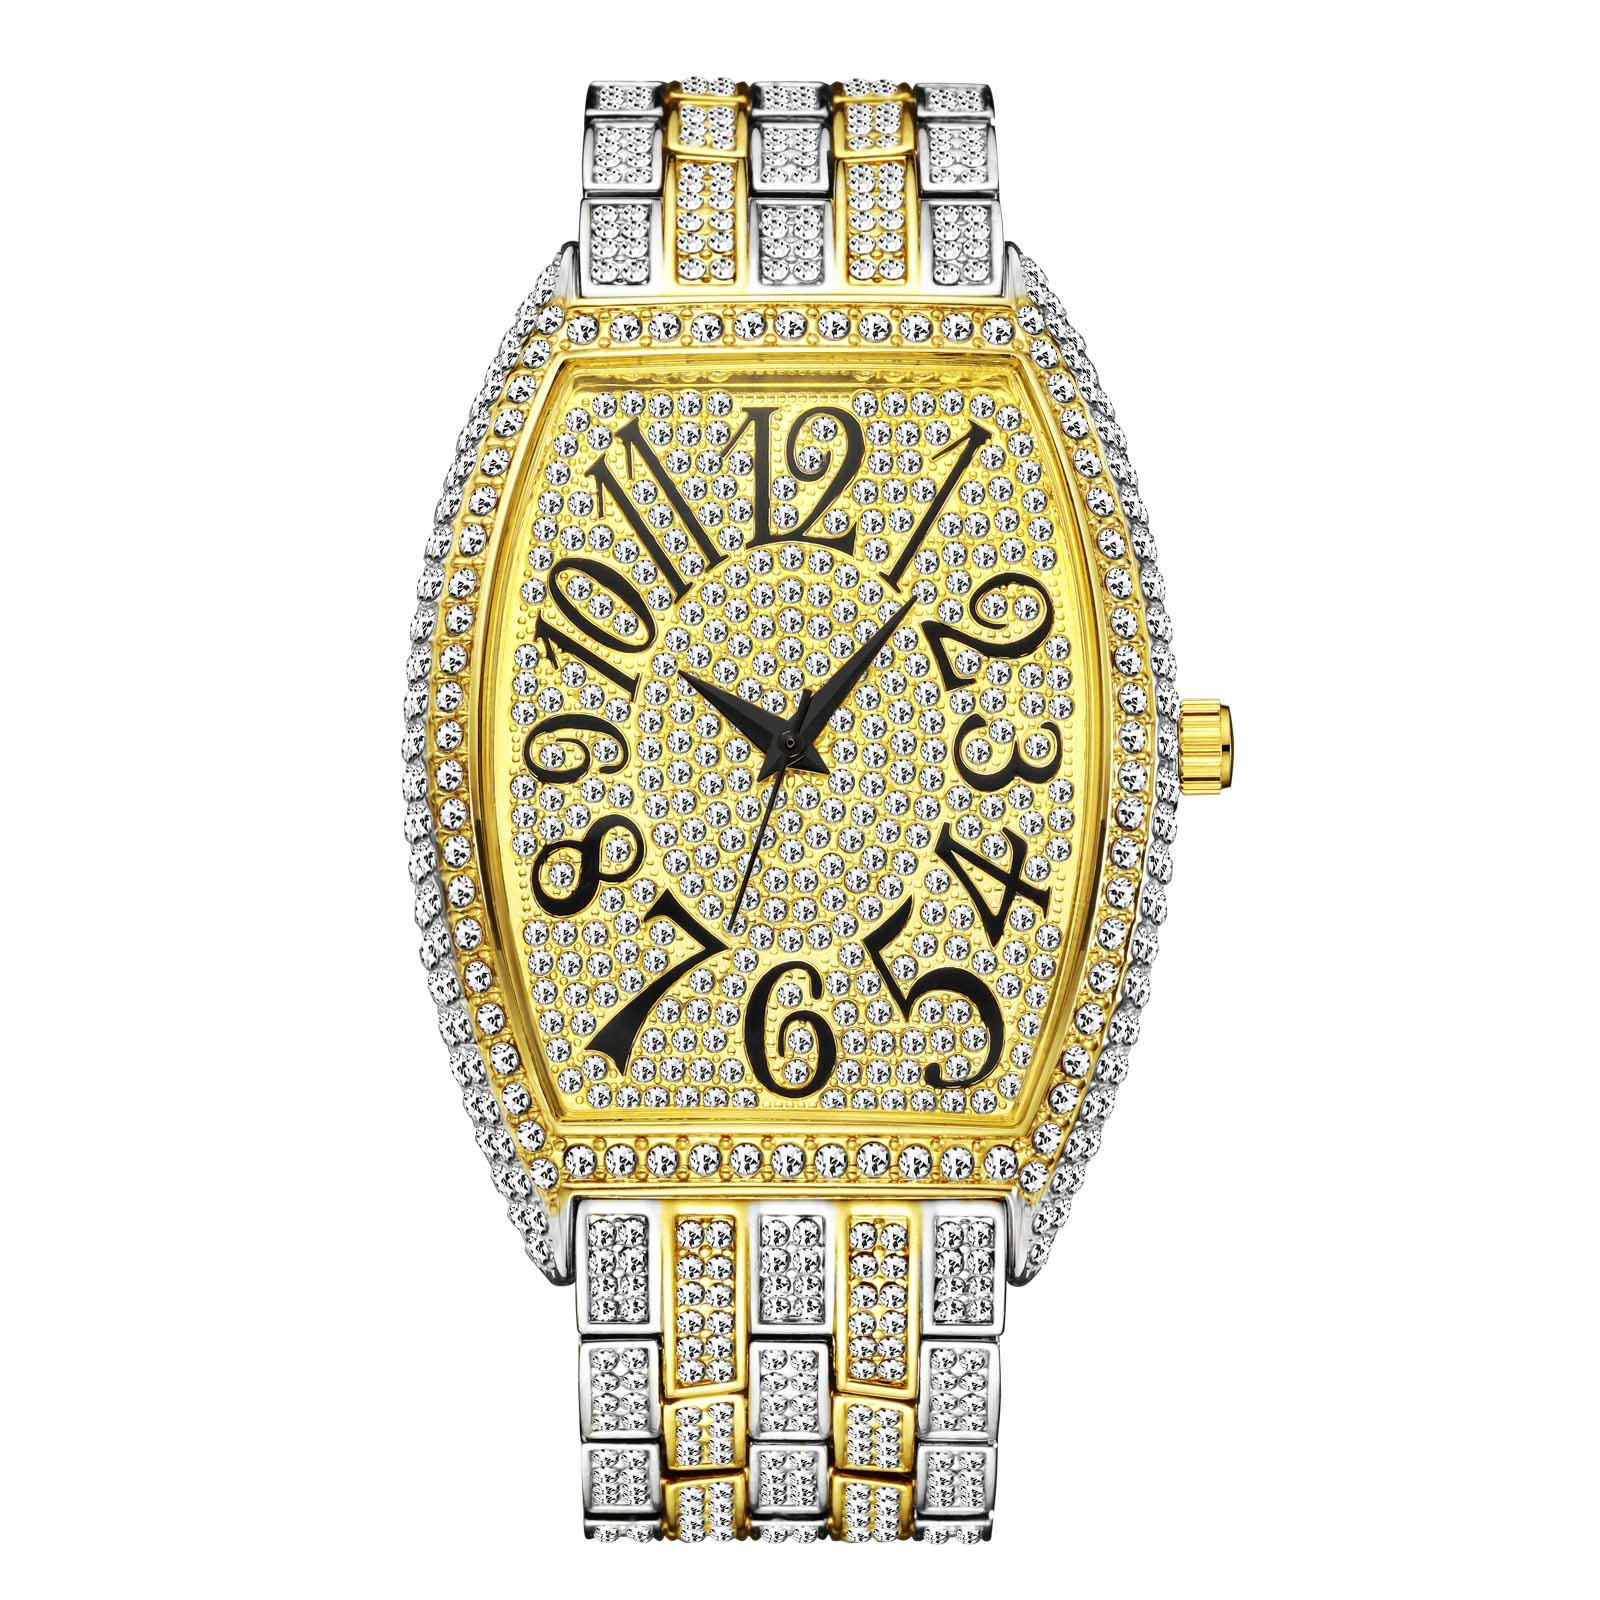 MISSFOX رجل ساعة مقاوم للماء بلينغ بلينغ الماس Tonneau الفاخرة الأعمال ساعة اليد كبيرة العربية العددية RM هدية دروبشيبينغ